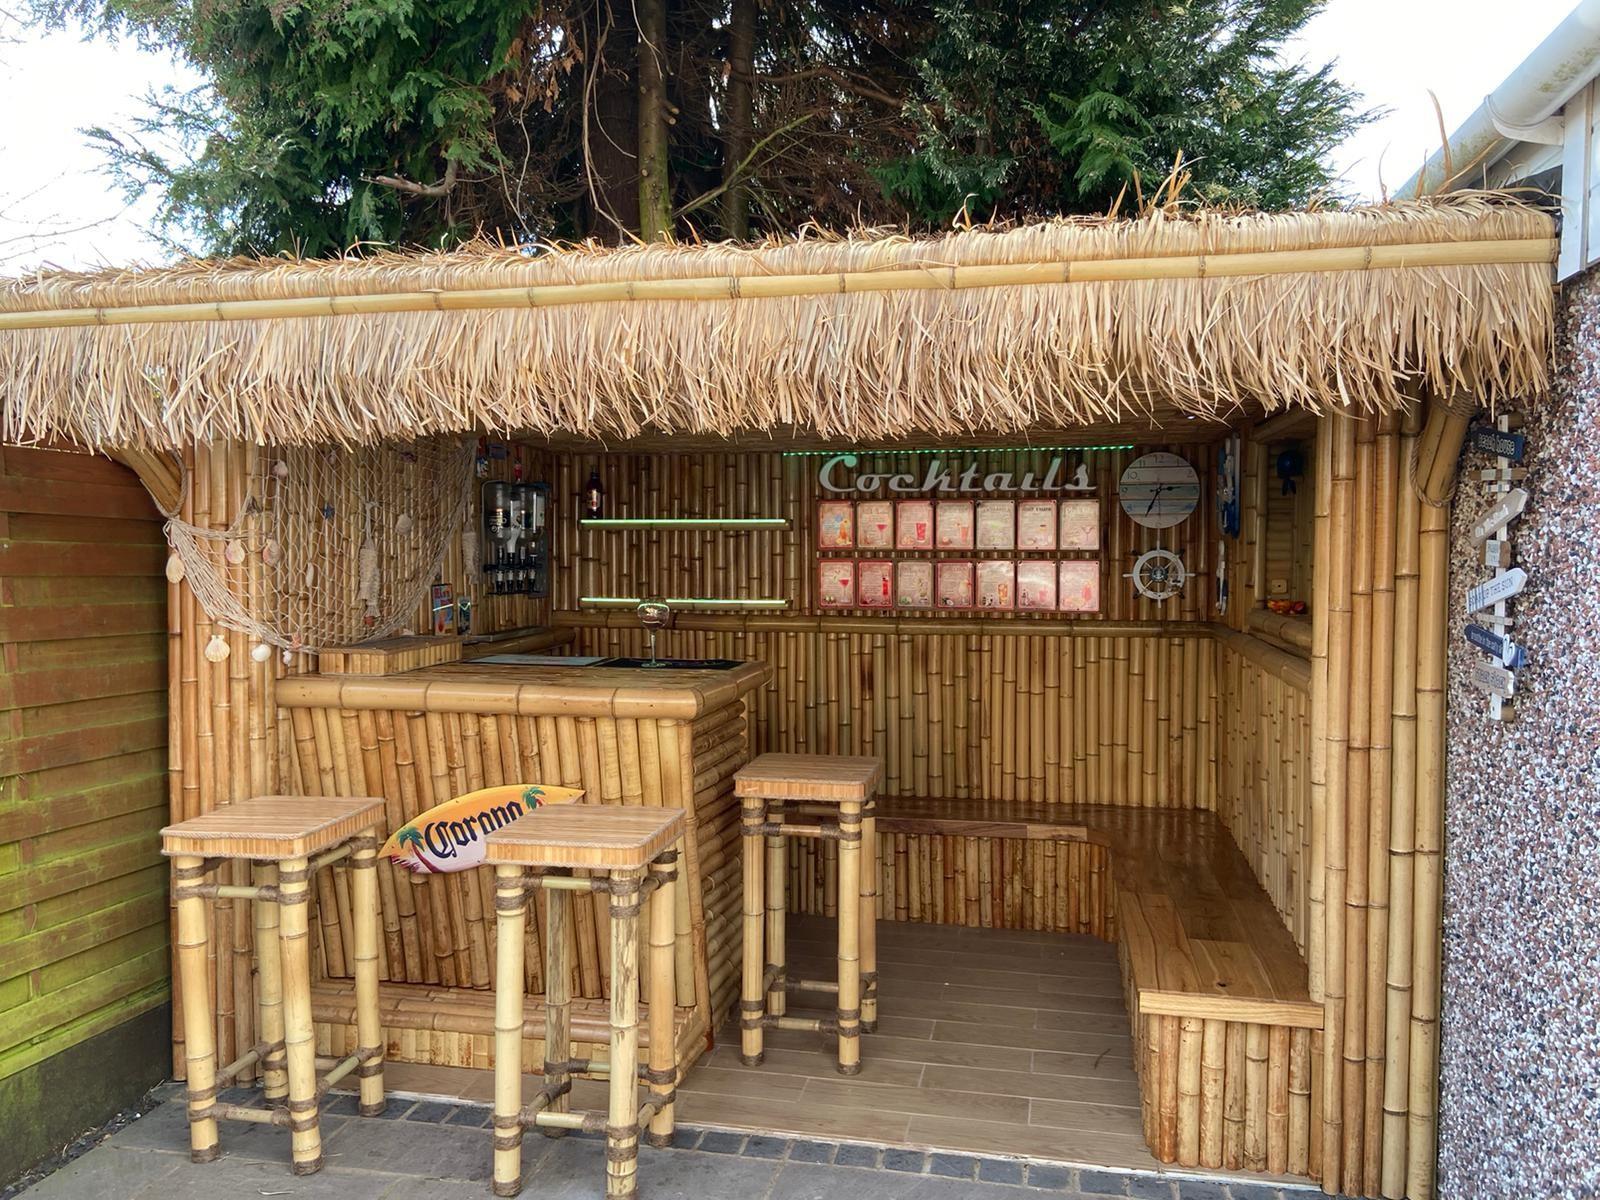 UK Bamboo supplies - Bamboo News & Inspiration